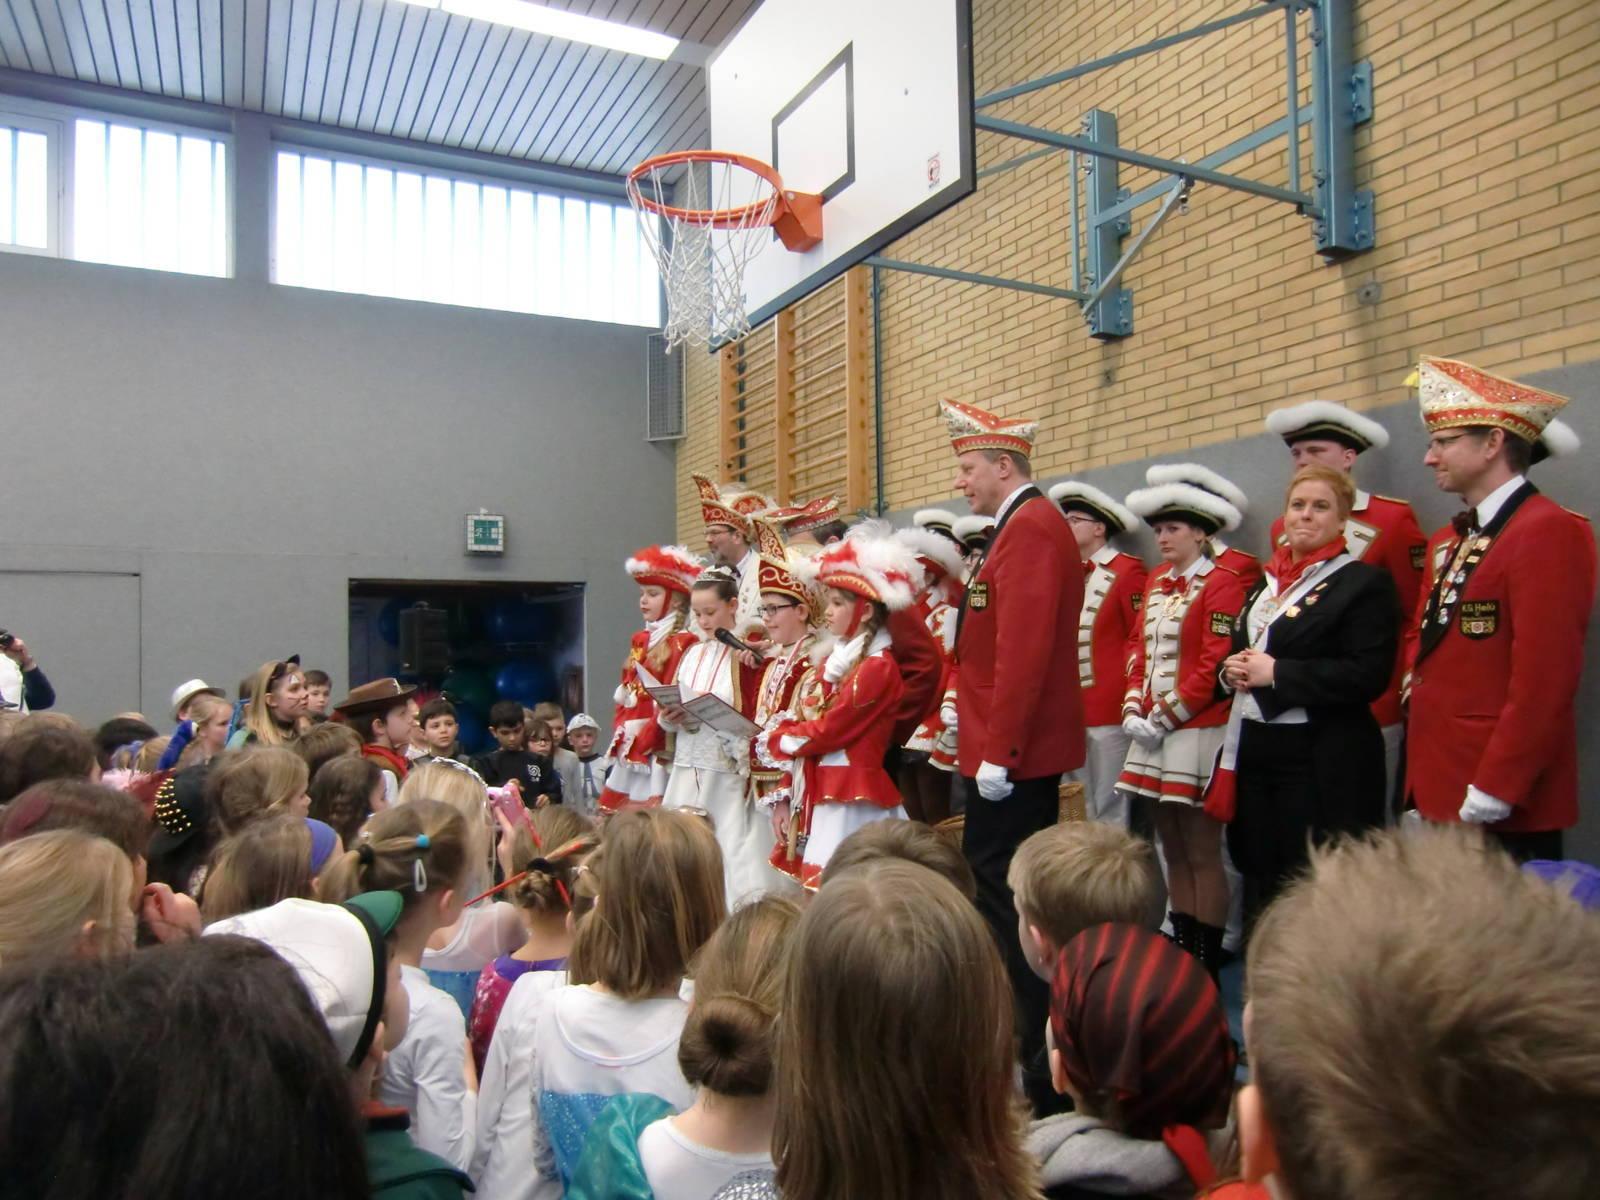 Karneval_Eichendorffschule_2017 (33)